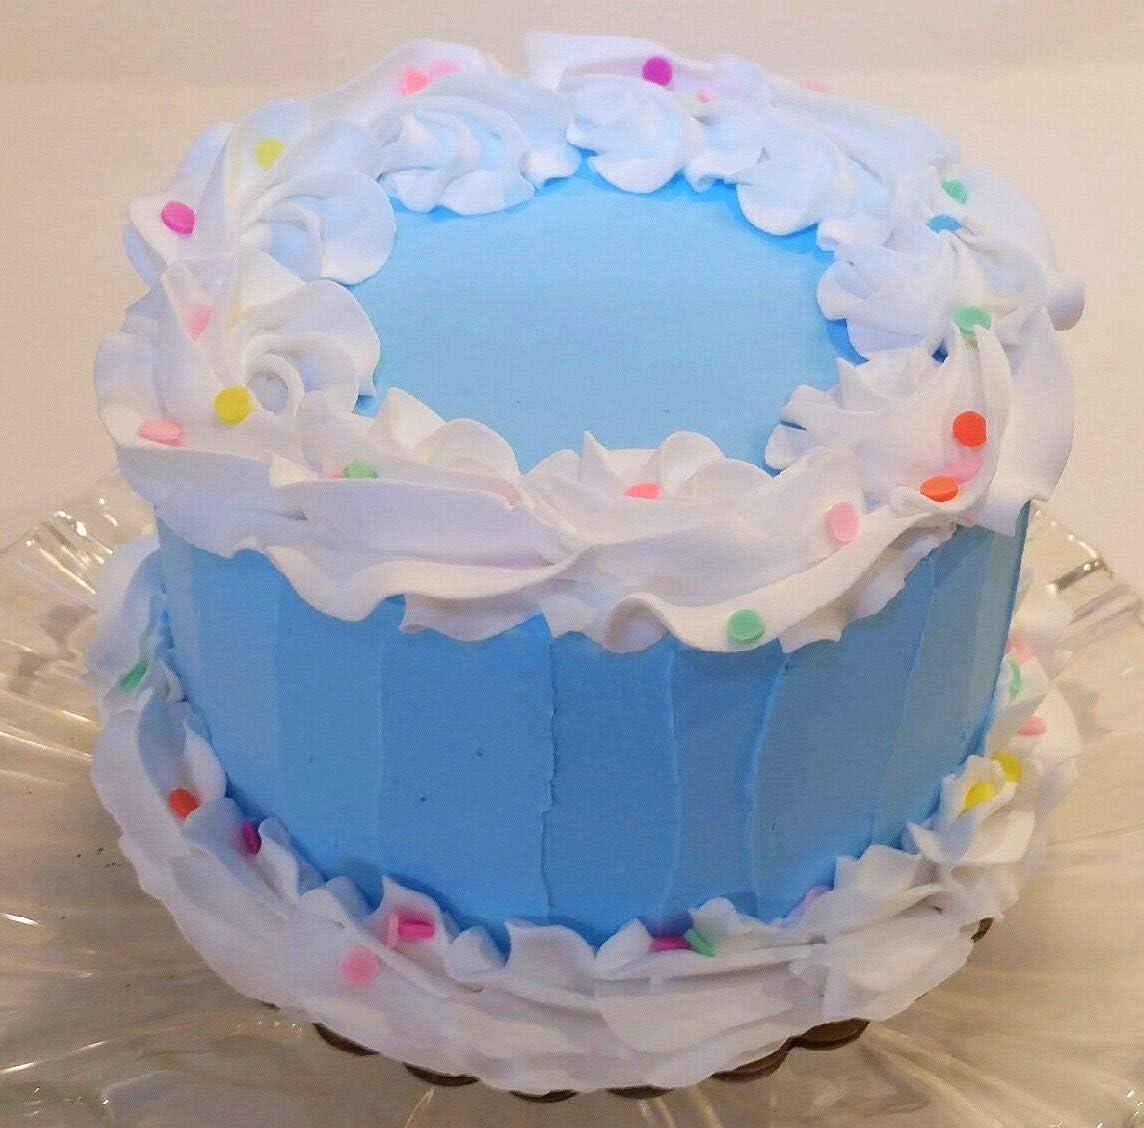 Groovy Amazon Com Dezicakes Fake Cake 6 Blue Birthday Cake Faux Cake Personalised Birthday Cards Sponlily Jamesorg